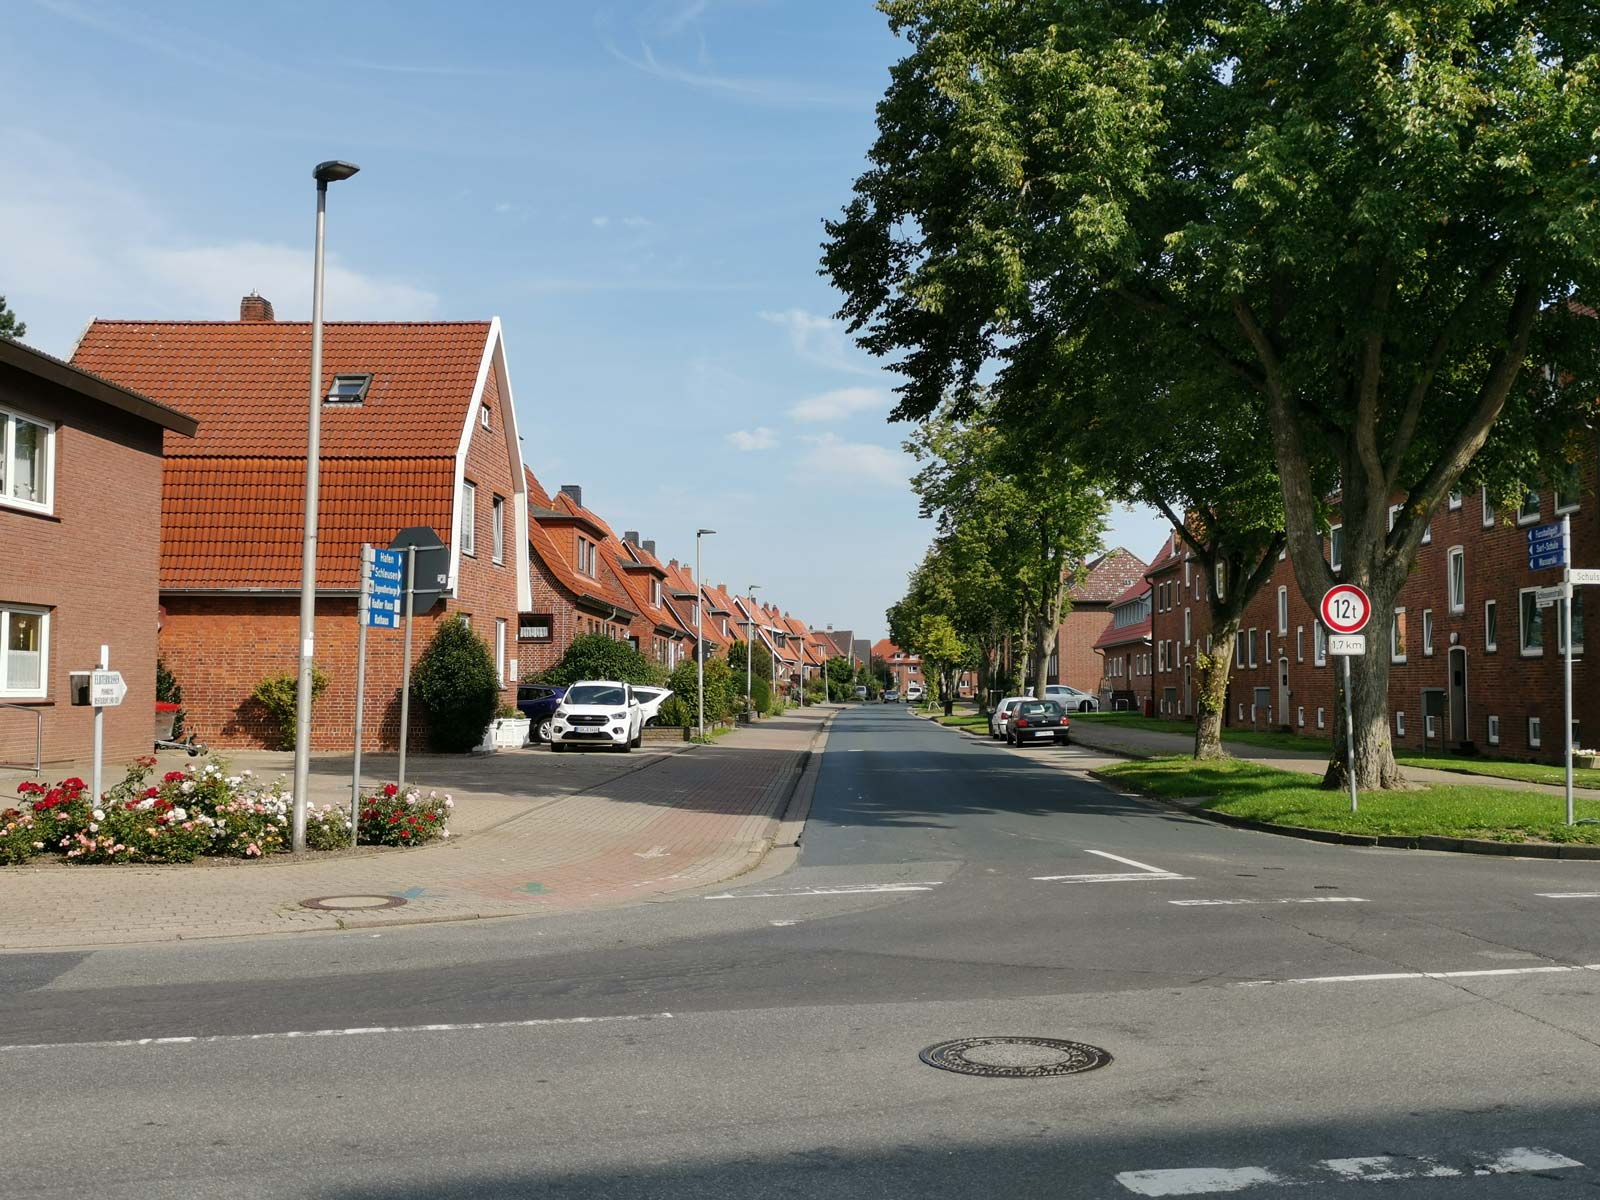 Fahrradweg in Otterndorf